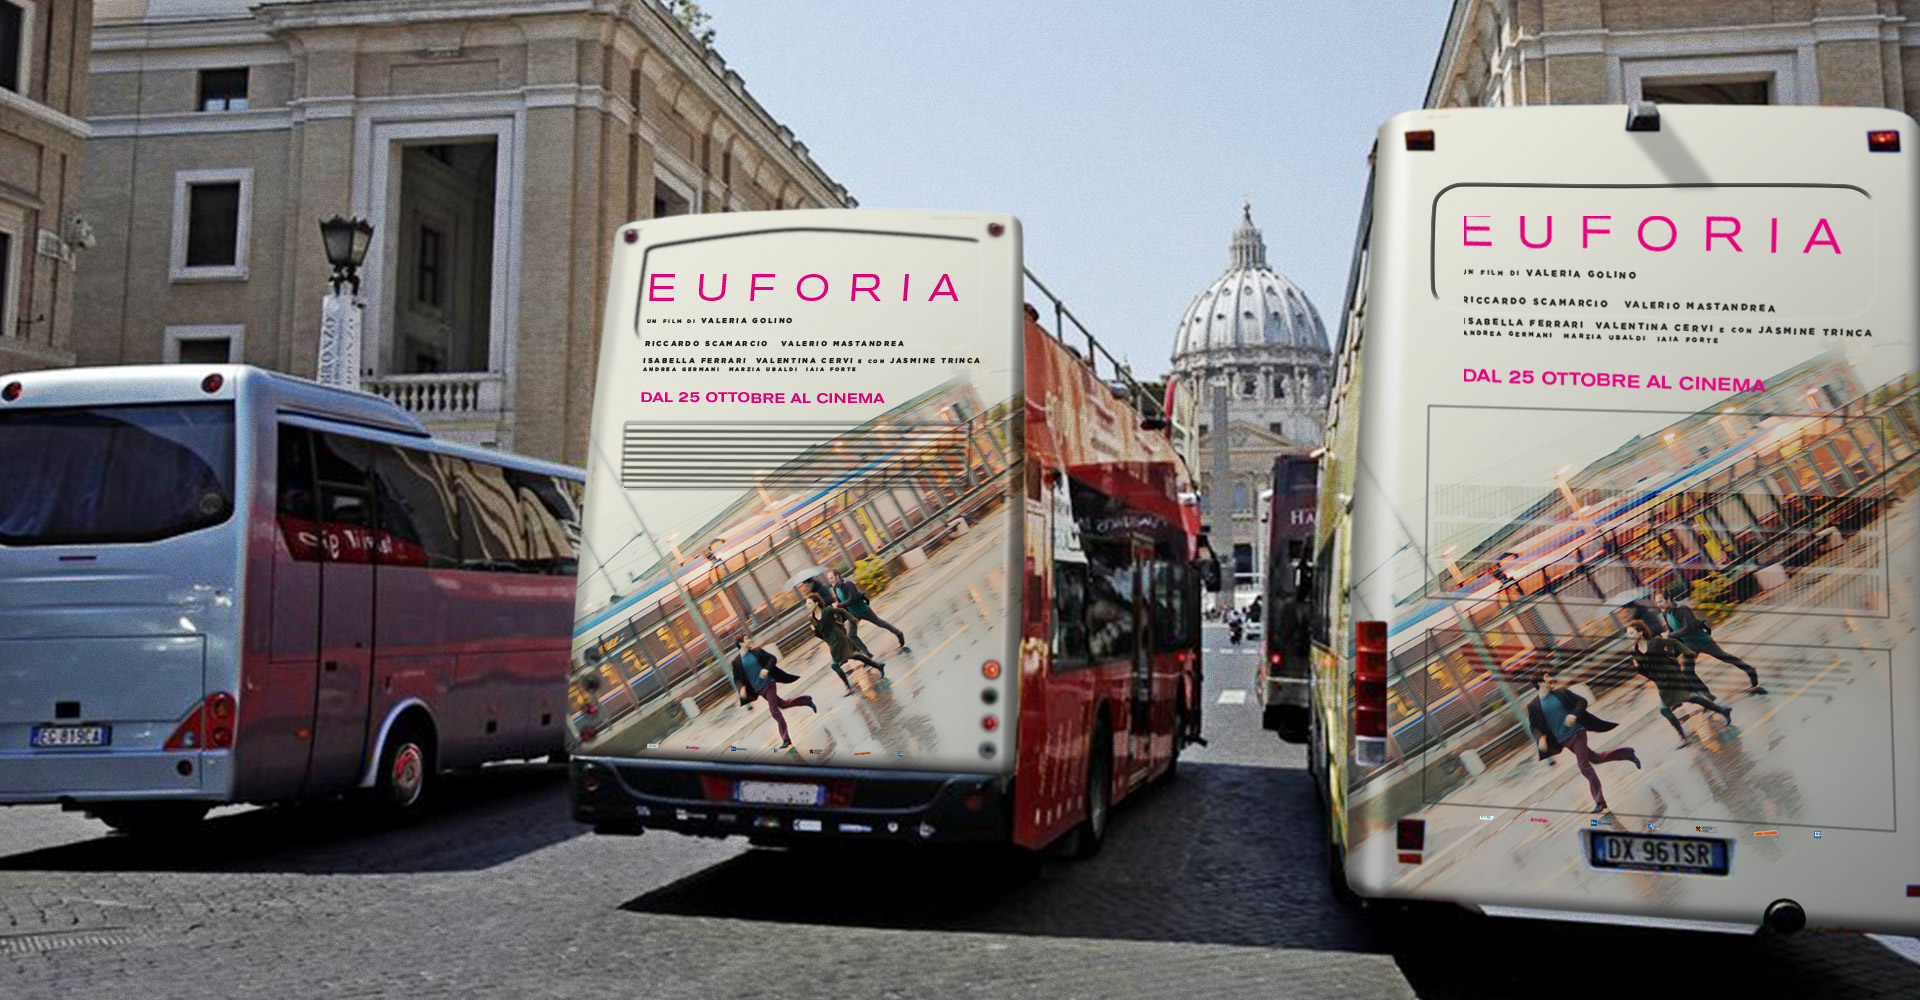 Euforia_Behance_06